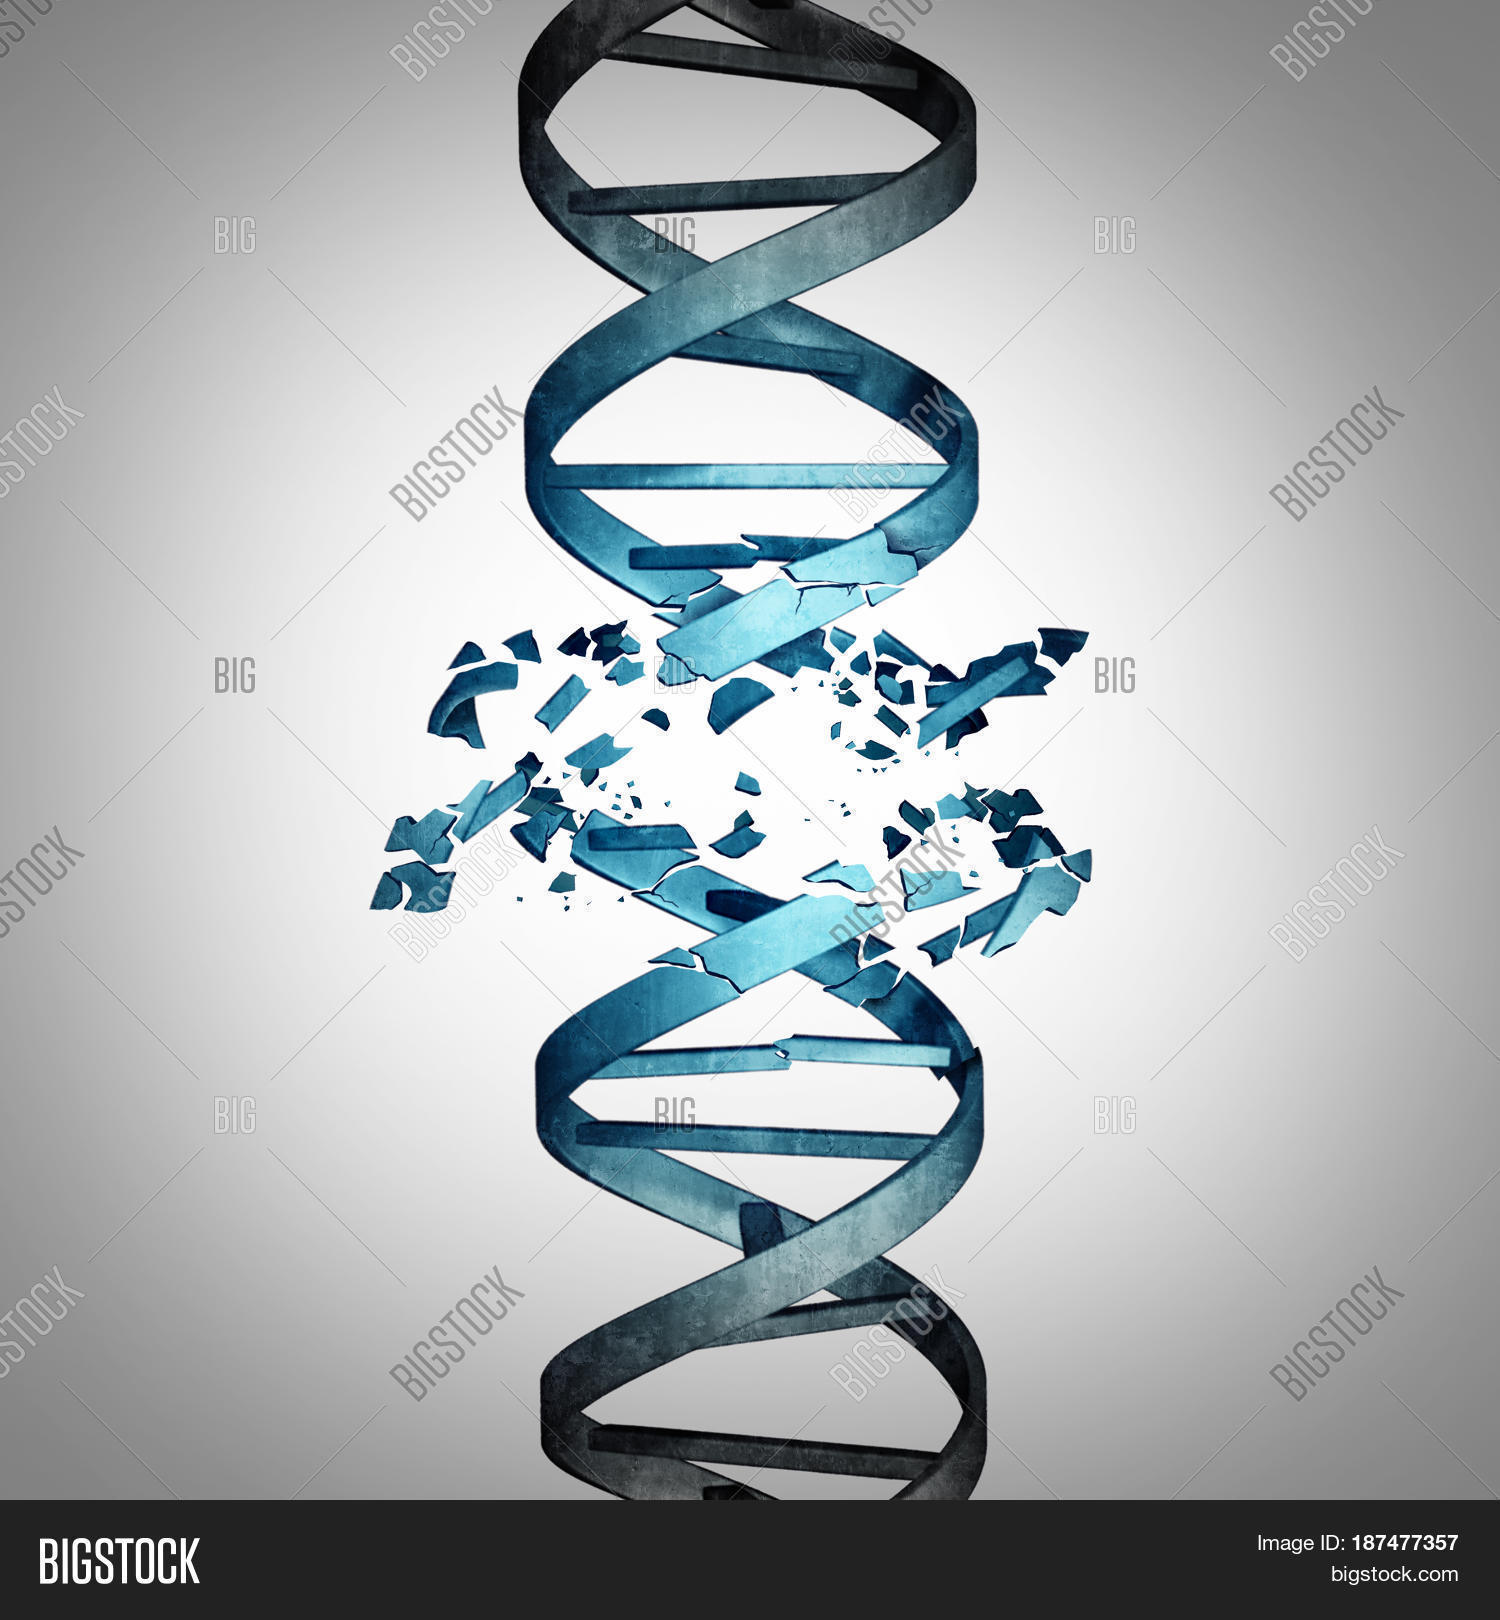 Damaged Dna Genetic Image Photo Free Trial Bigstock